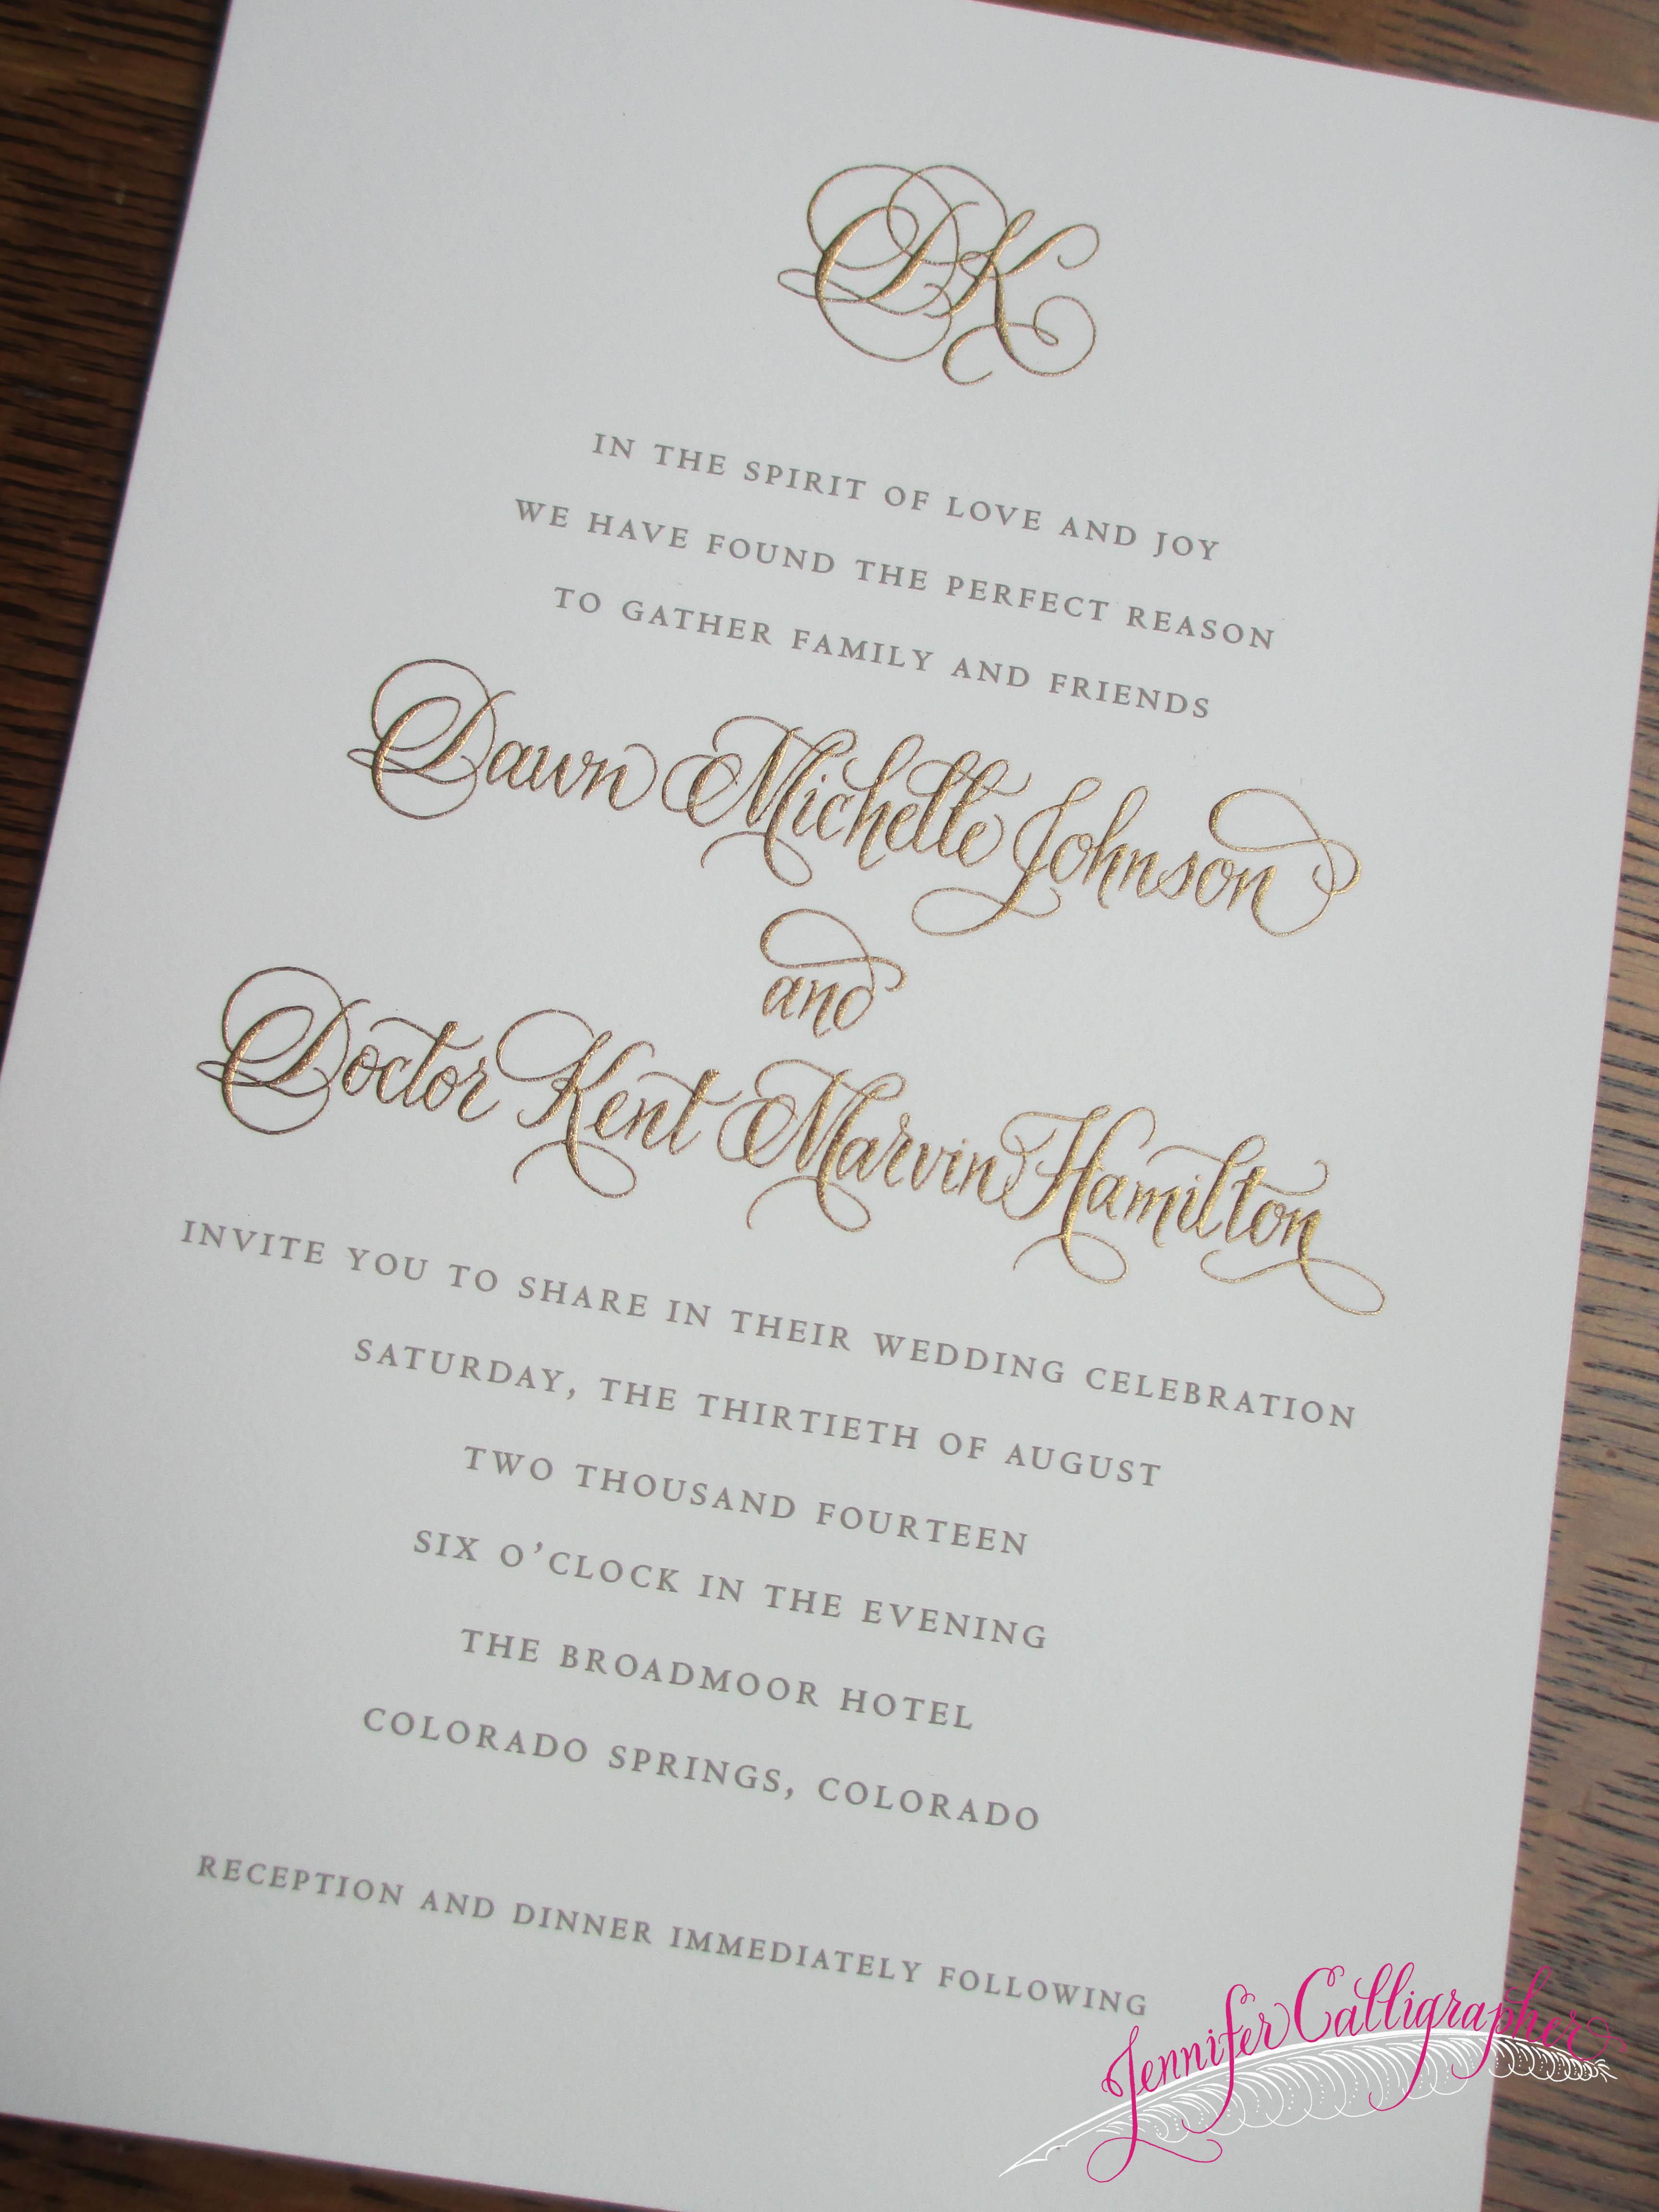 Calligraphy Wedding Invitation Jennifercalligraphy Moderncalligraphy